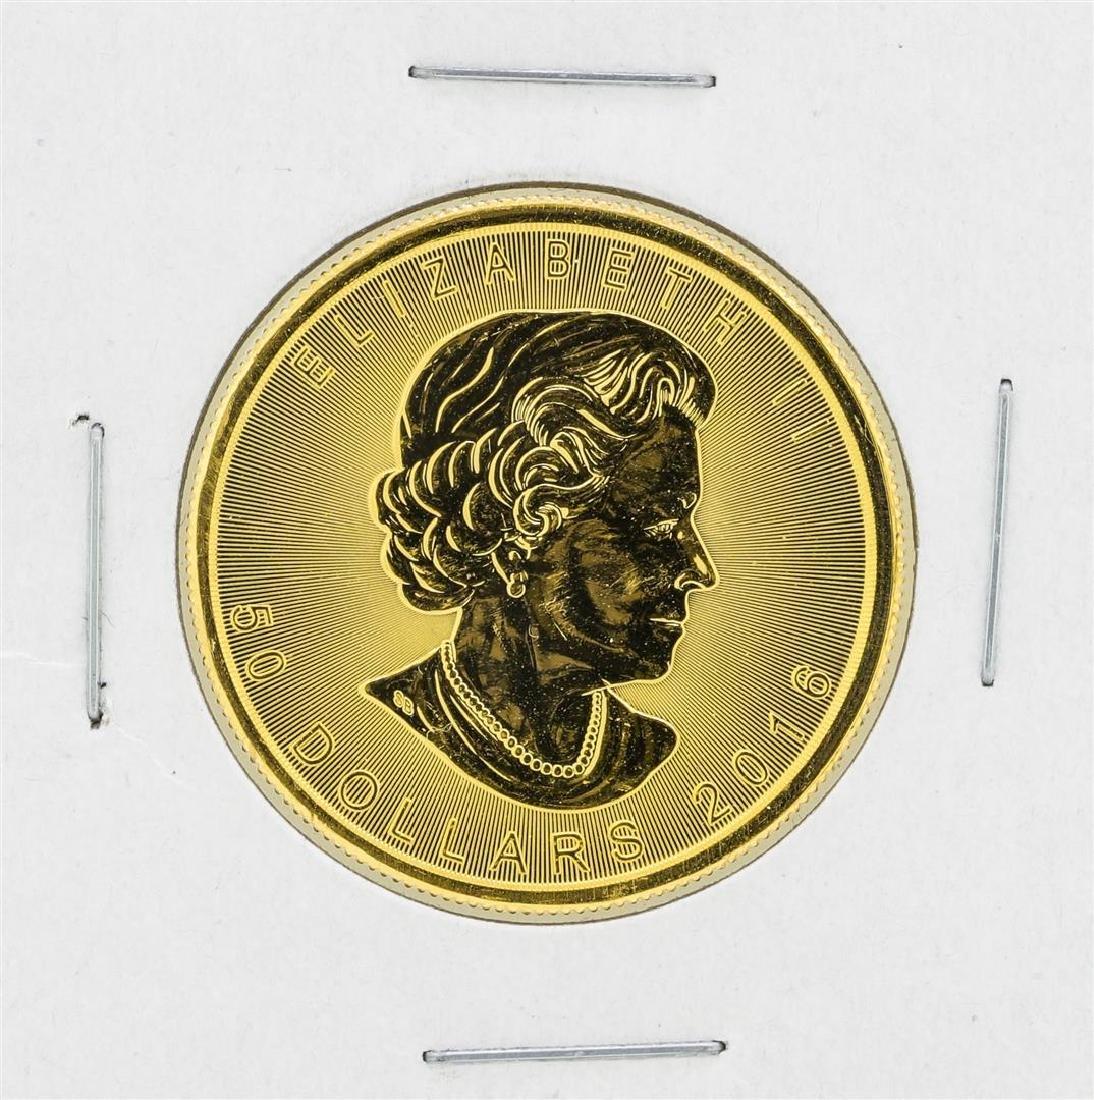 2016 Canadian $50 Gold Maple Leaf